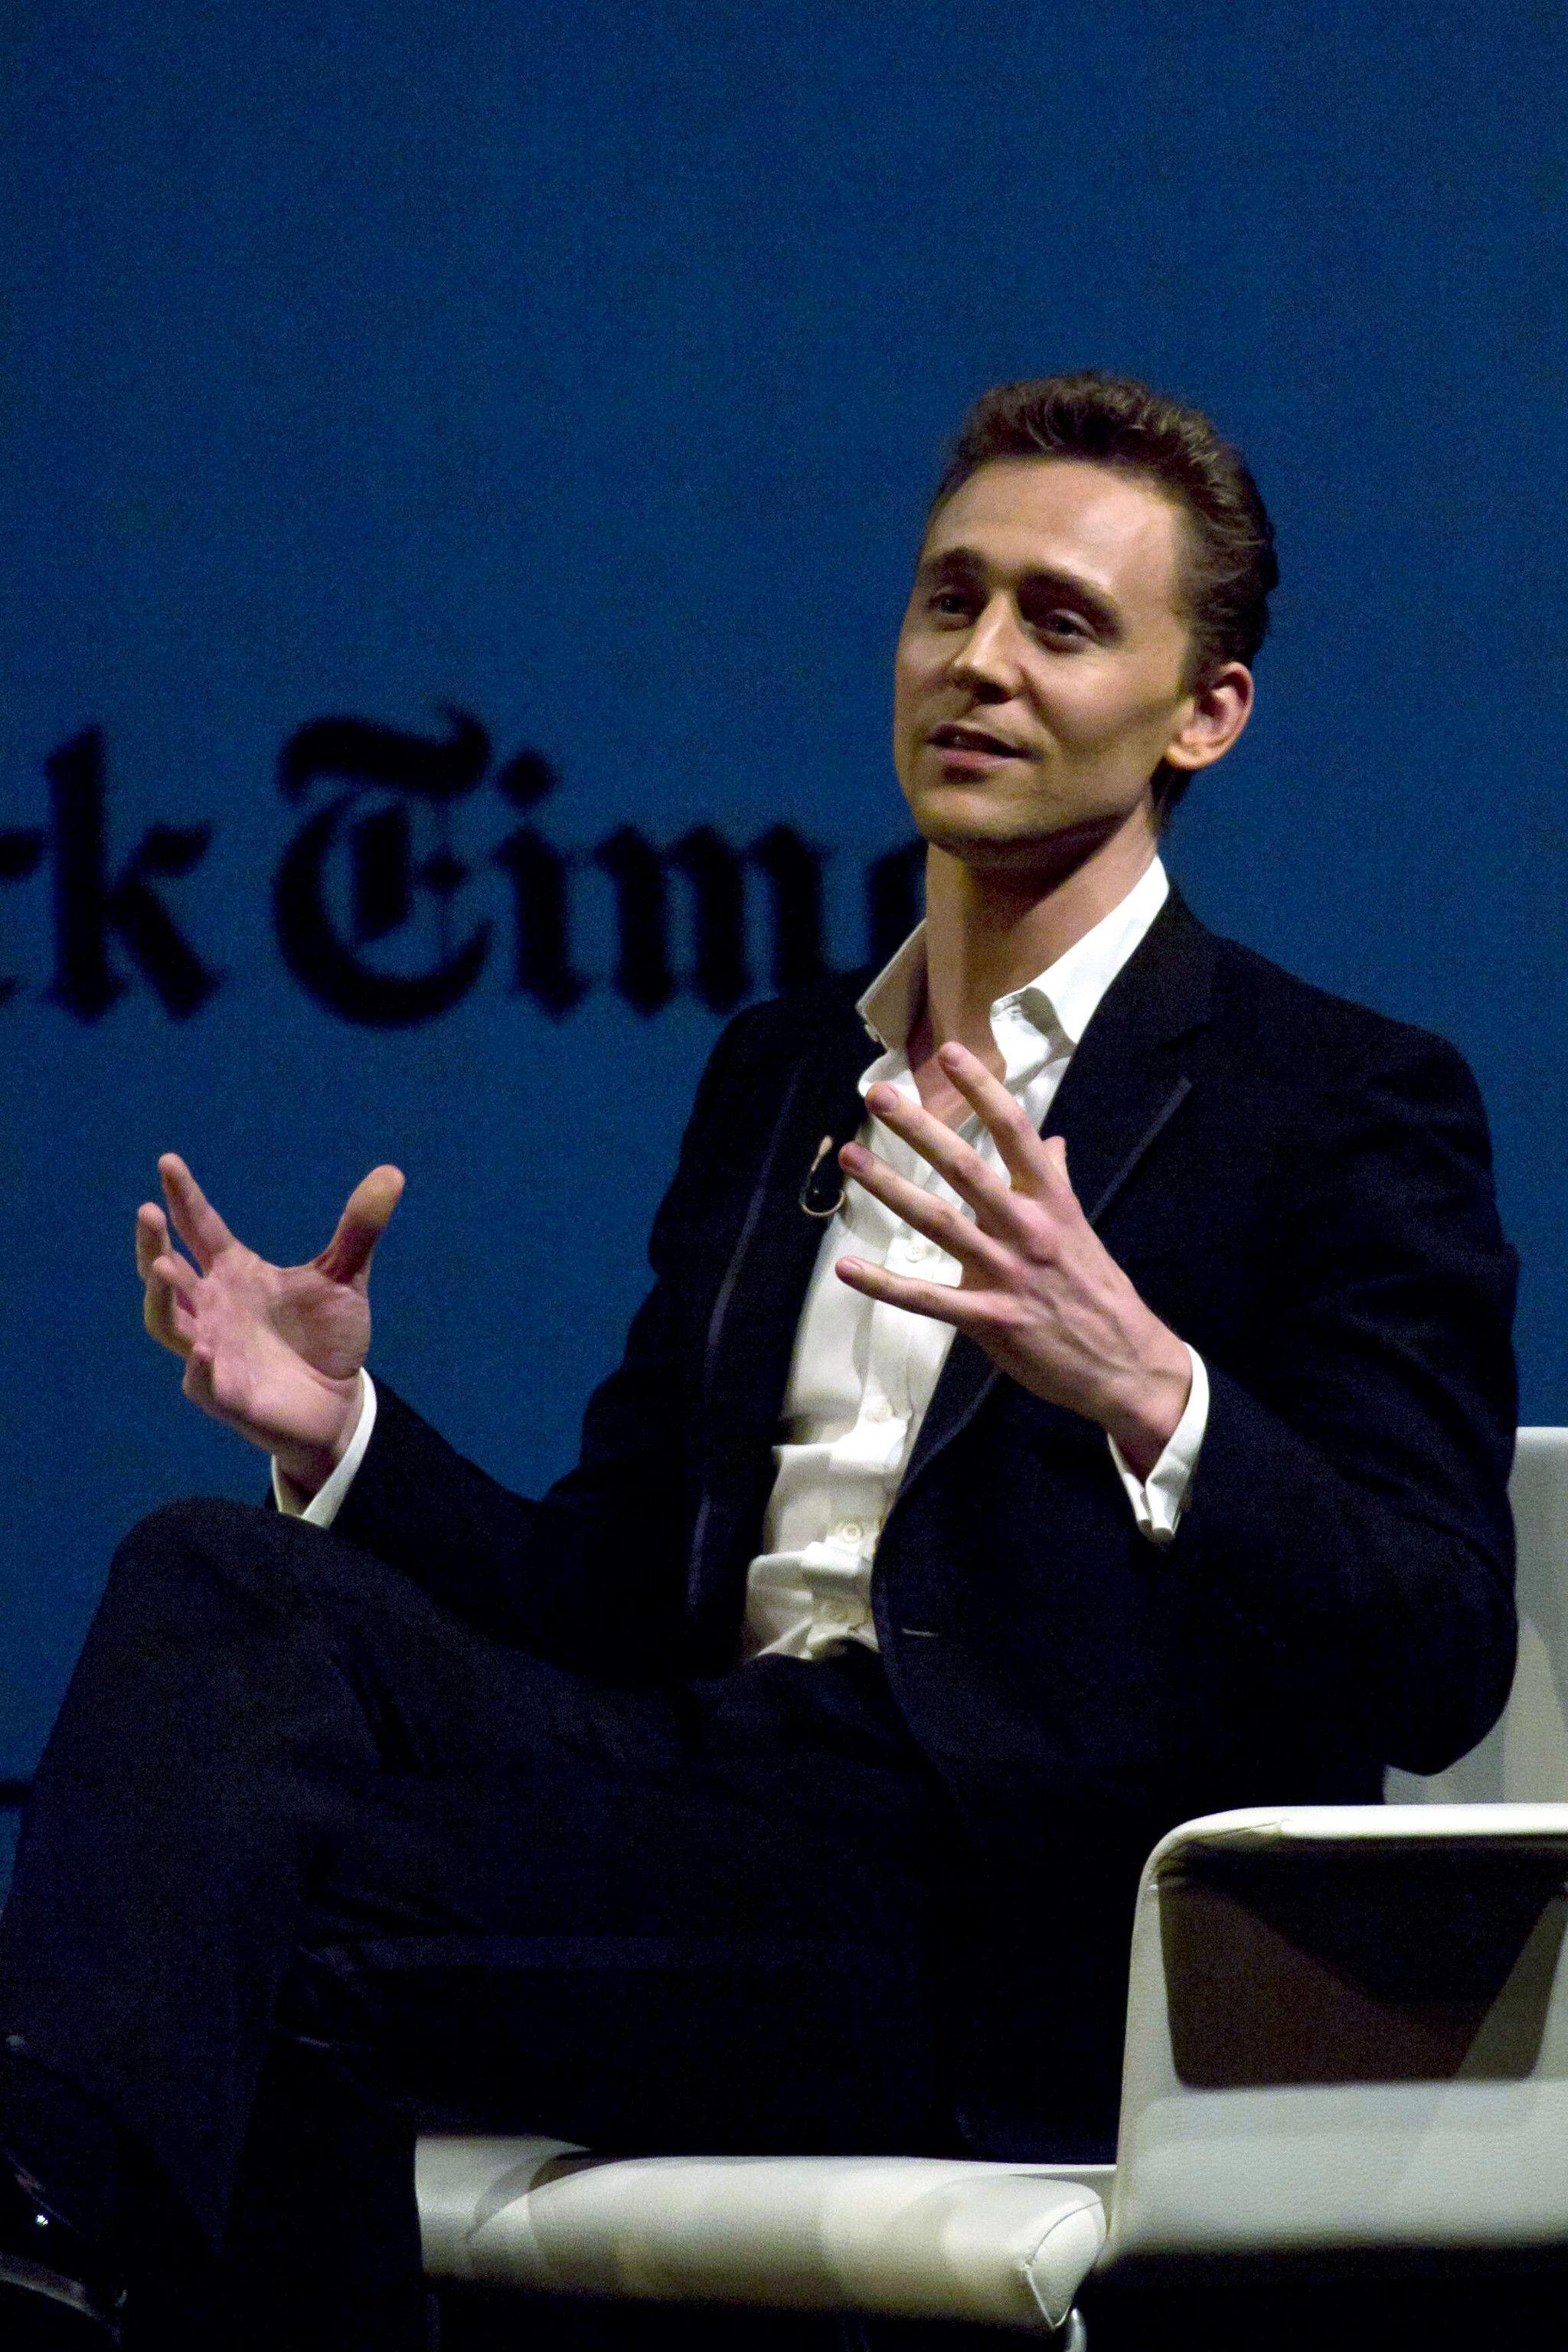 Tom Hiddleston. Times Talks Madrid. 2012. Via Torrilla.